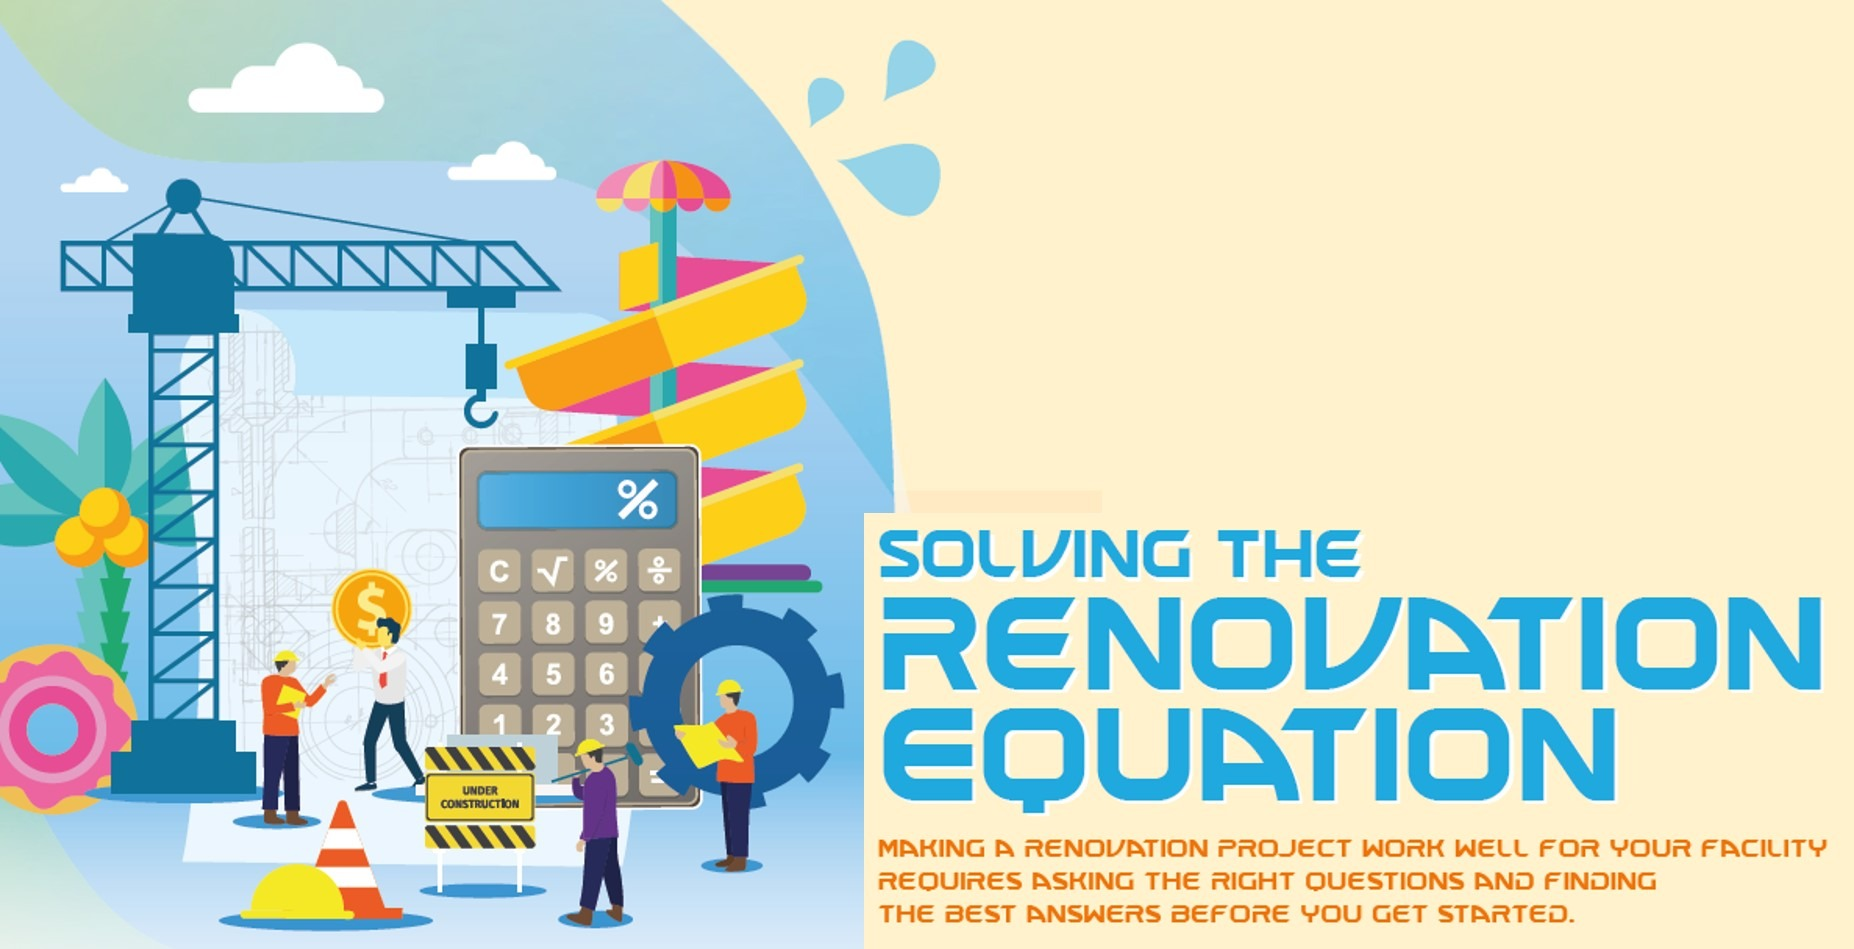 renovation equation